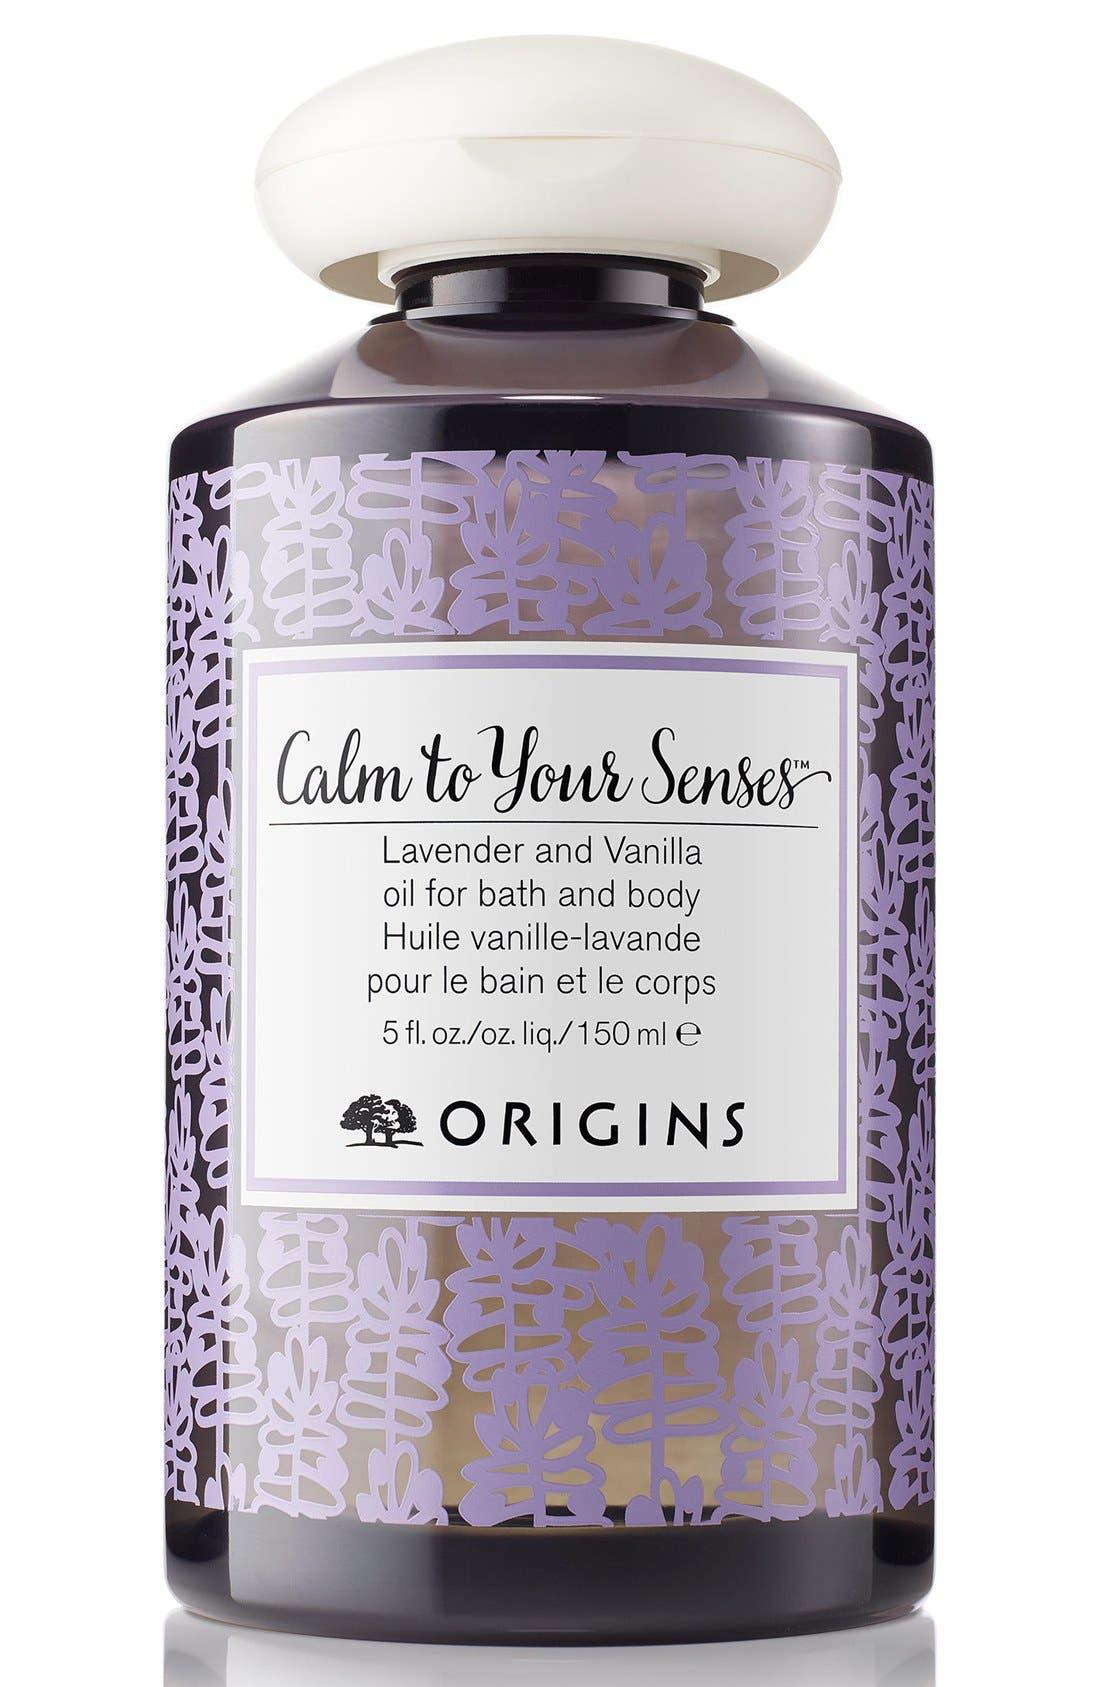 Origins Calm To Your Senses™ Lavender and Vanilla Oil for Bath and Body